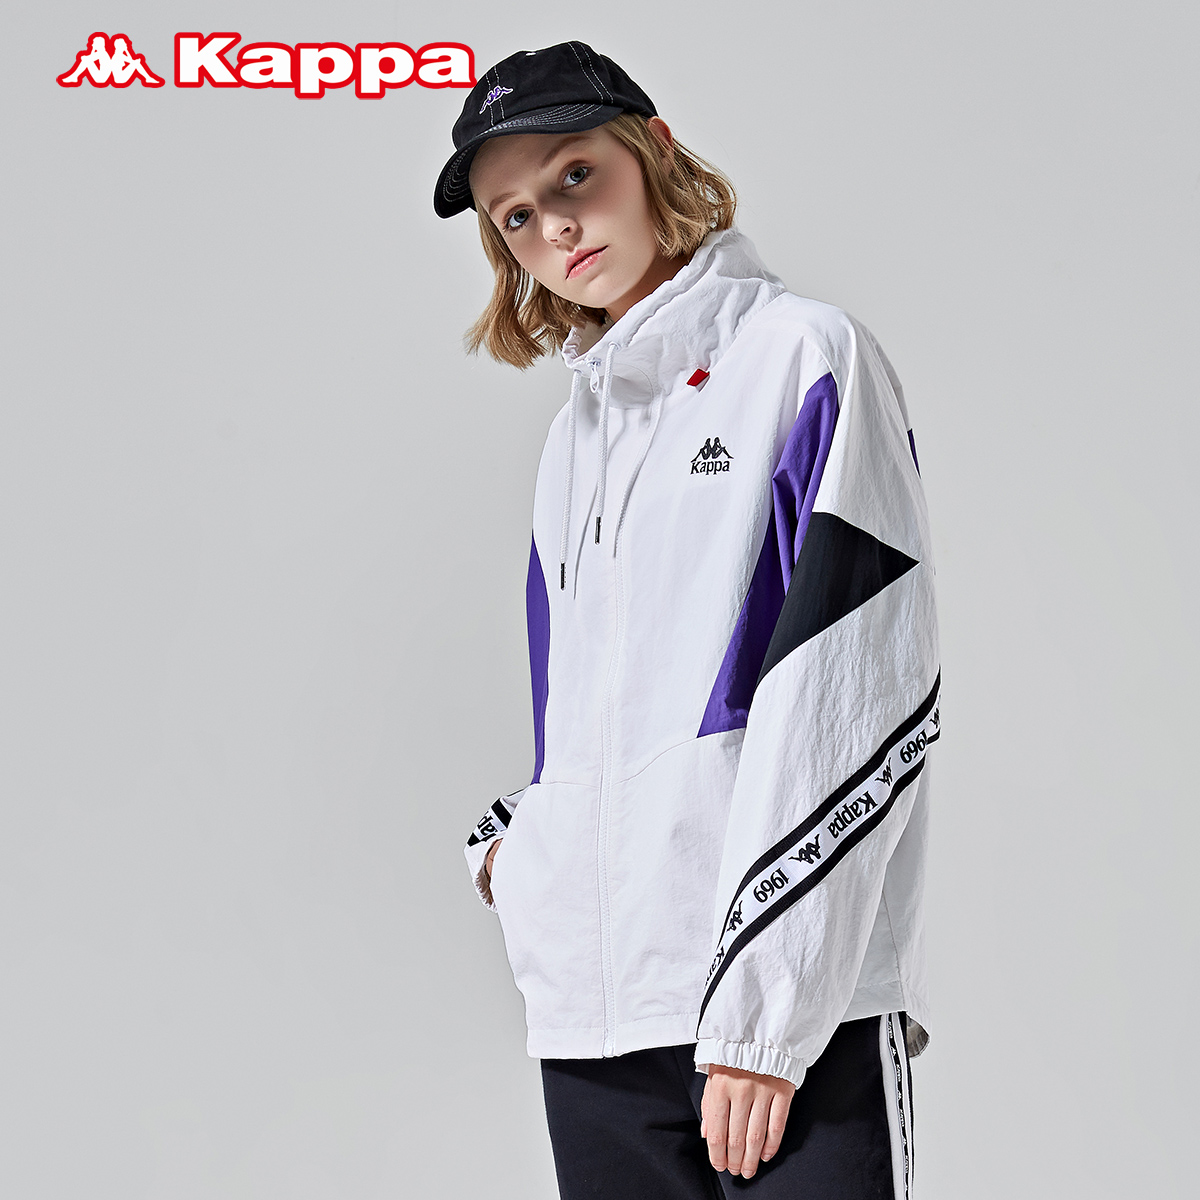 K0962FJ06D 新款 2019 女款防风梭织外套休闲长袖开衫 卡帕 Kappa